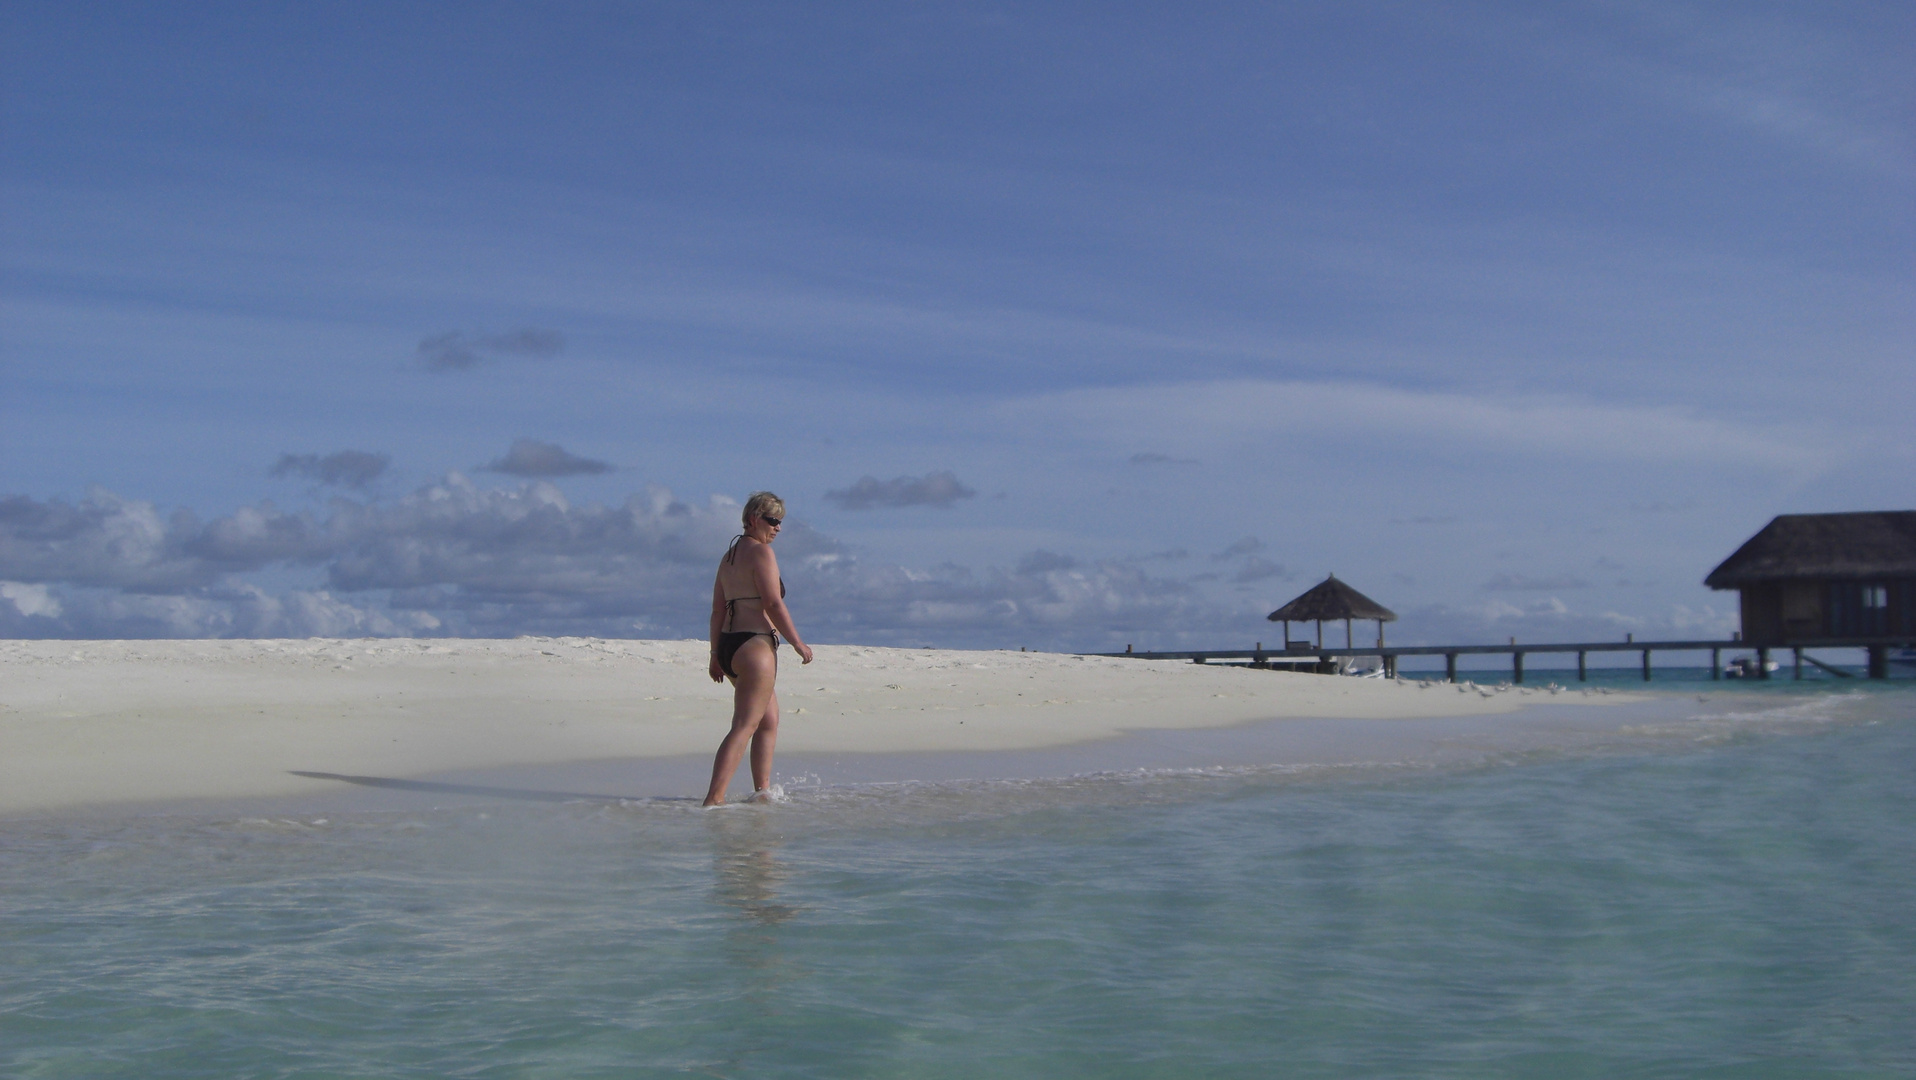 Traumstrände 3.6 (Malediven, Mirihi, Ari Atoll)